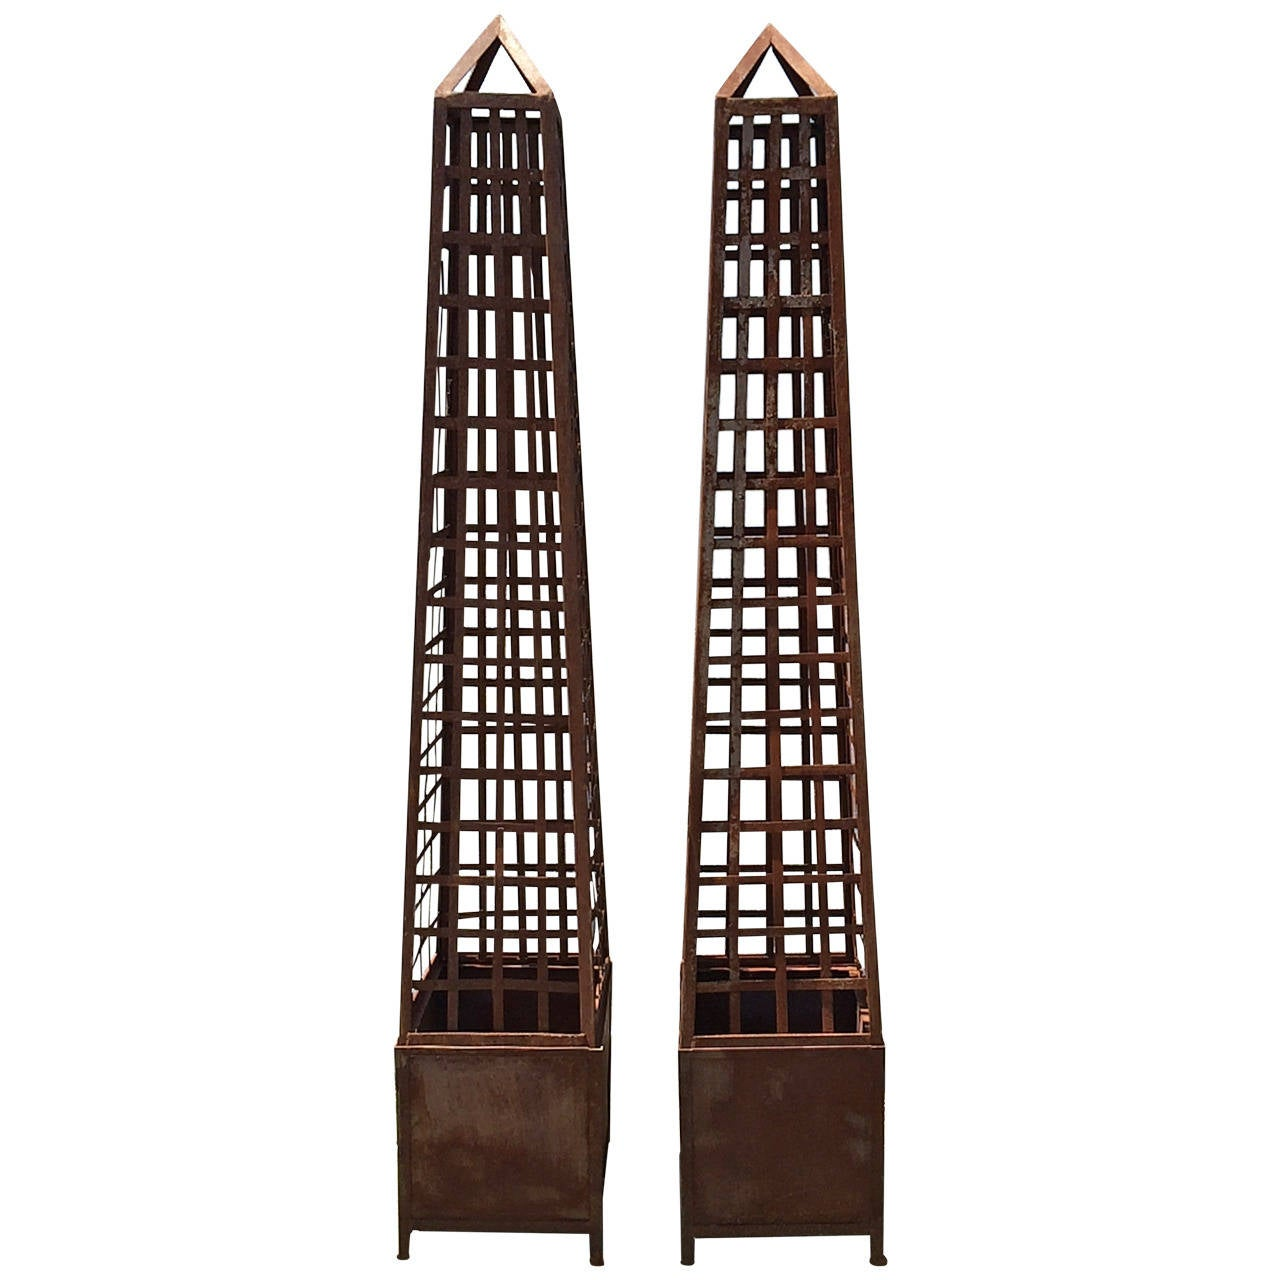 Pair of Monumental Iron Latticework Obelisks with Planters